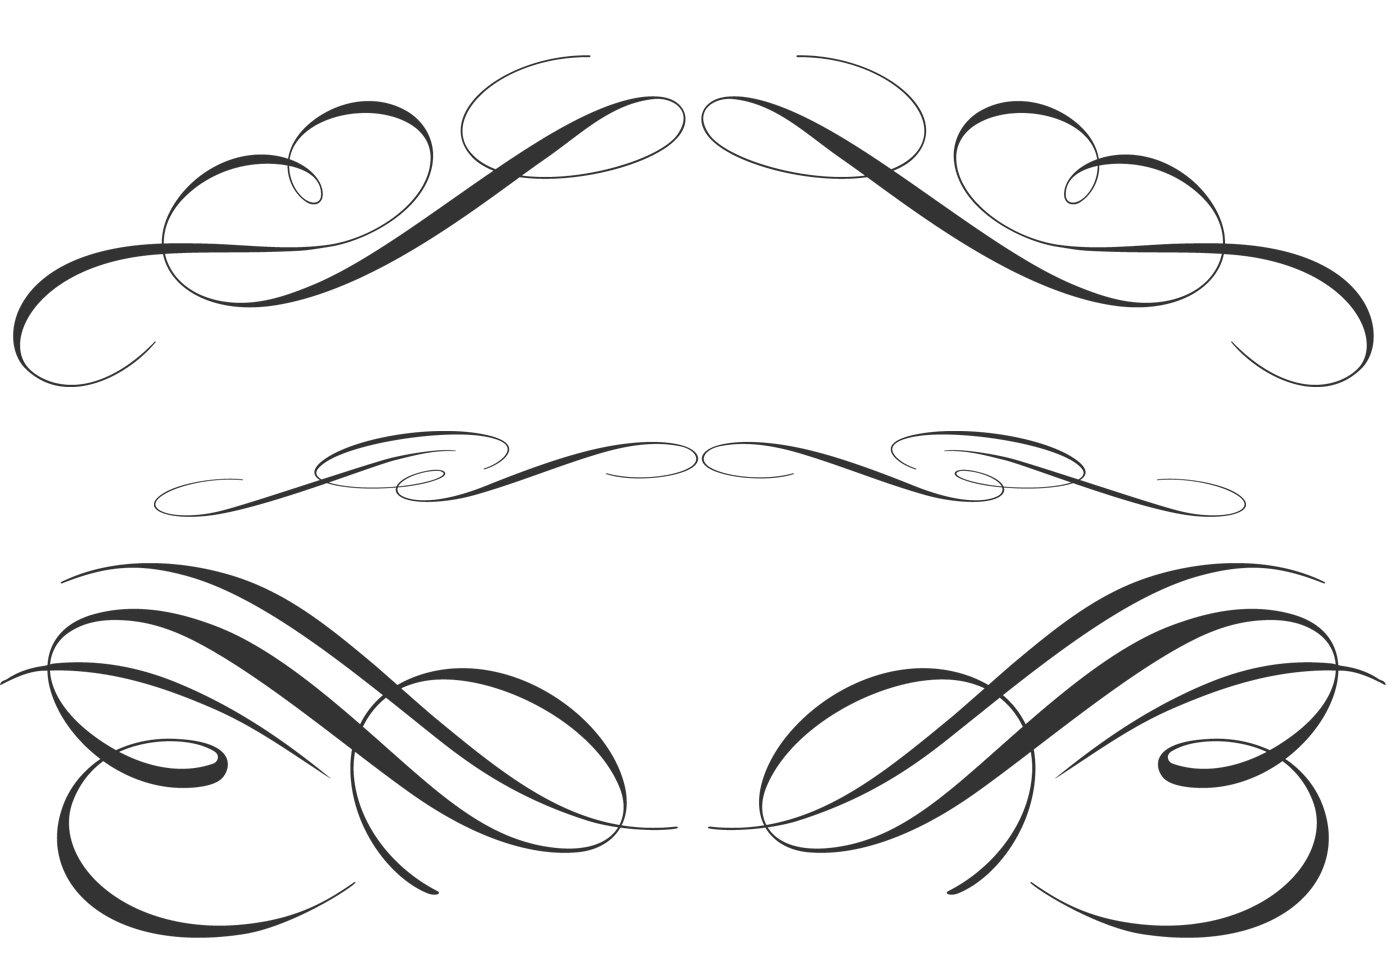 Free calligraphic ornament brushes photoshop